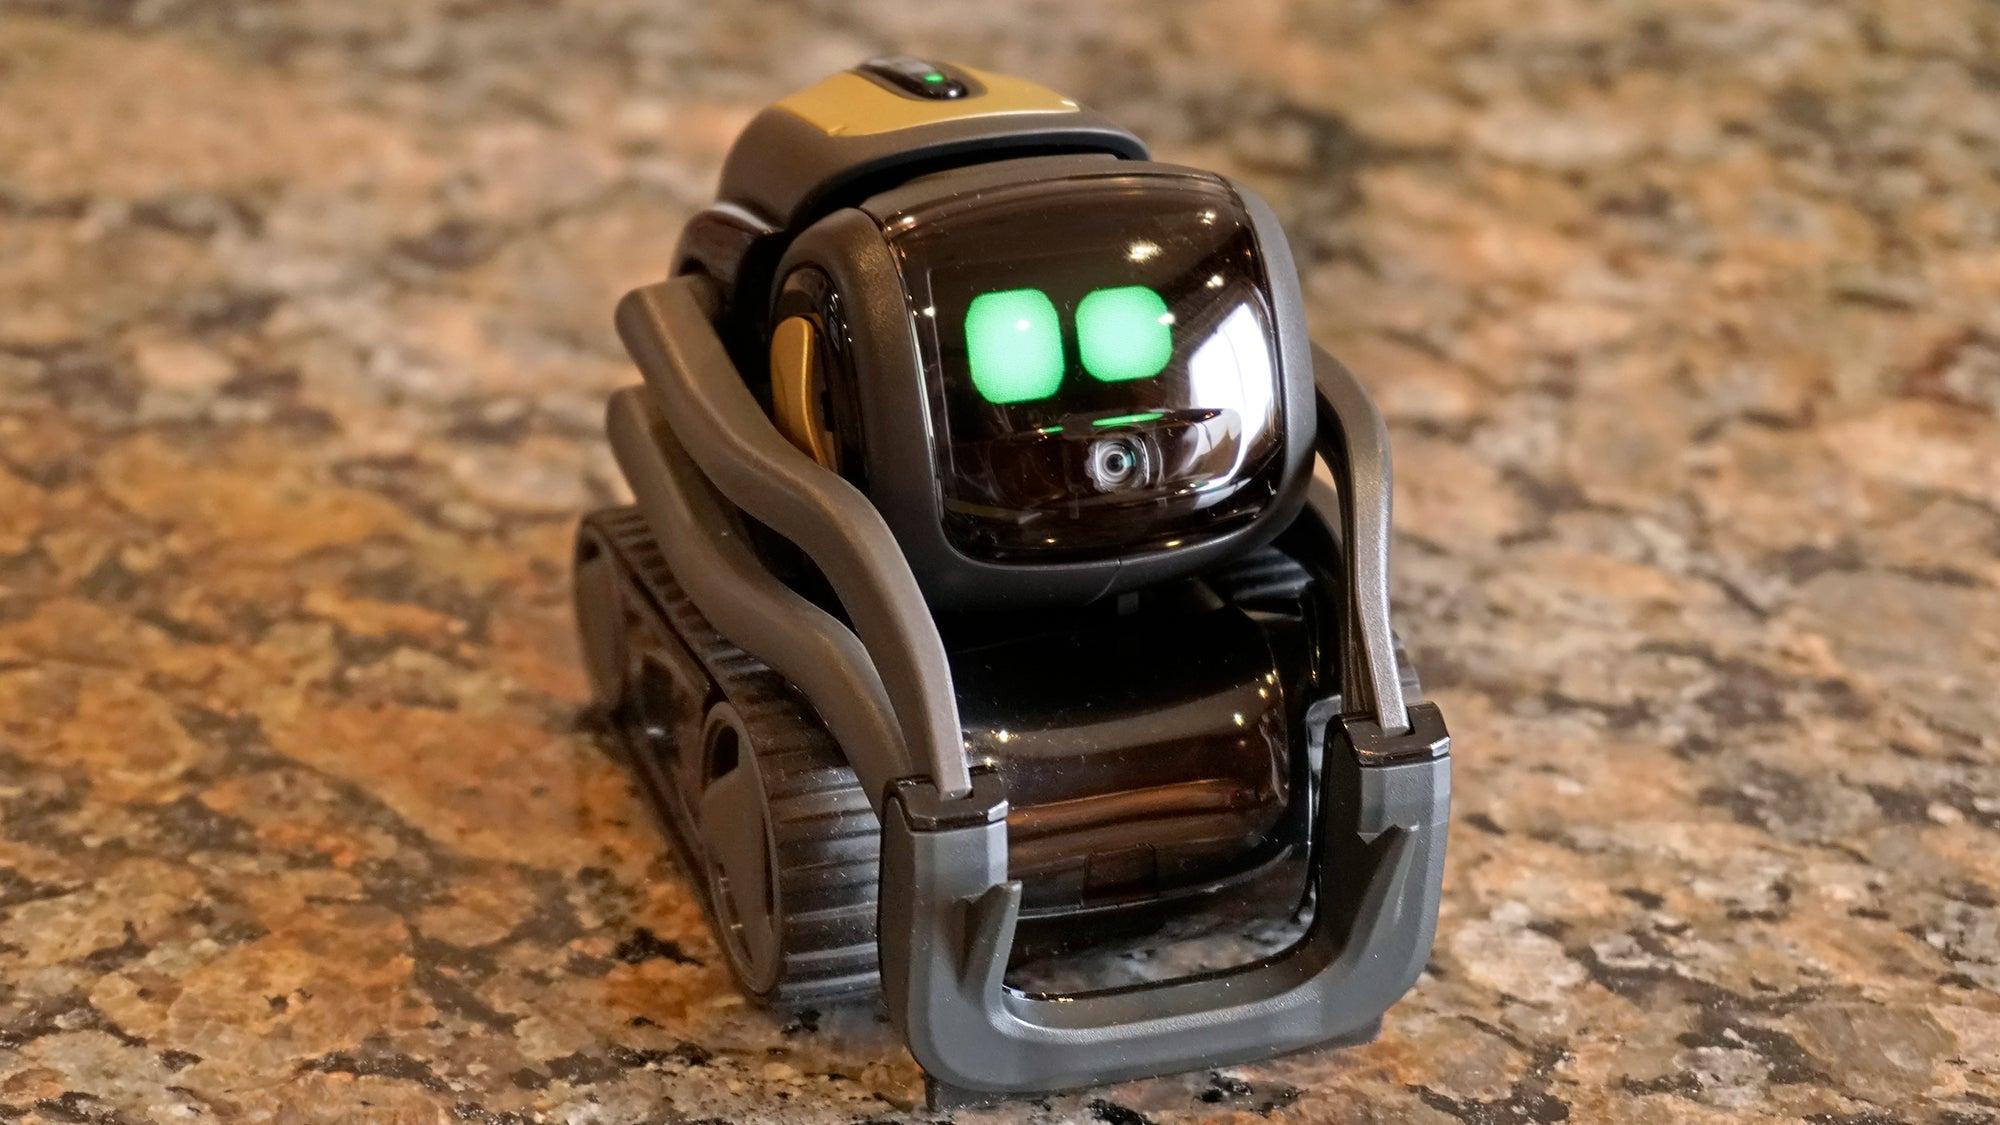 This Little Robot Broke My Heart | Gizmodo Australia